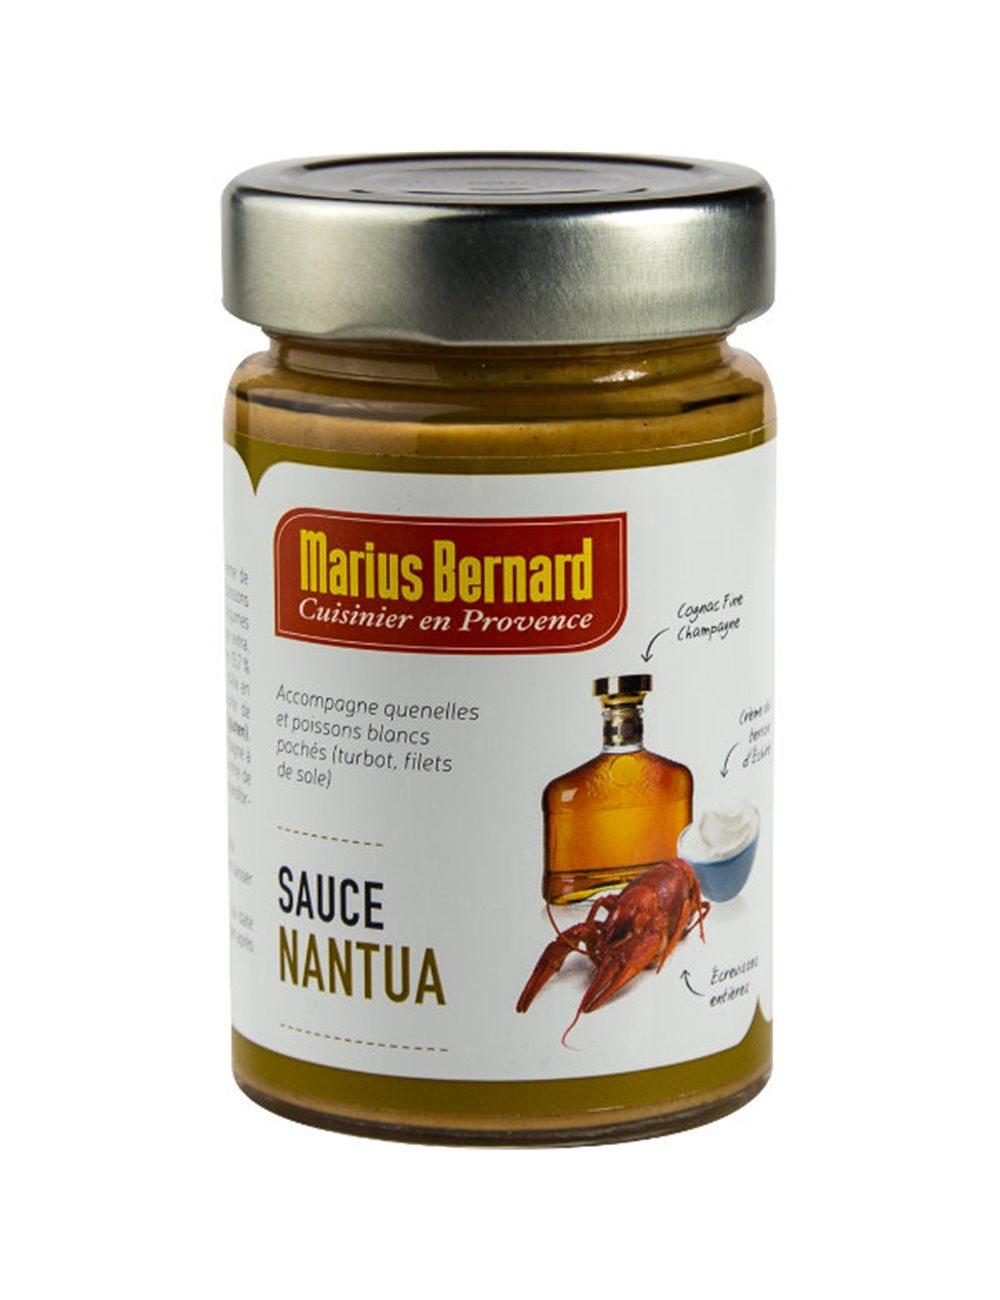 Sauce Nantua 190g